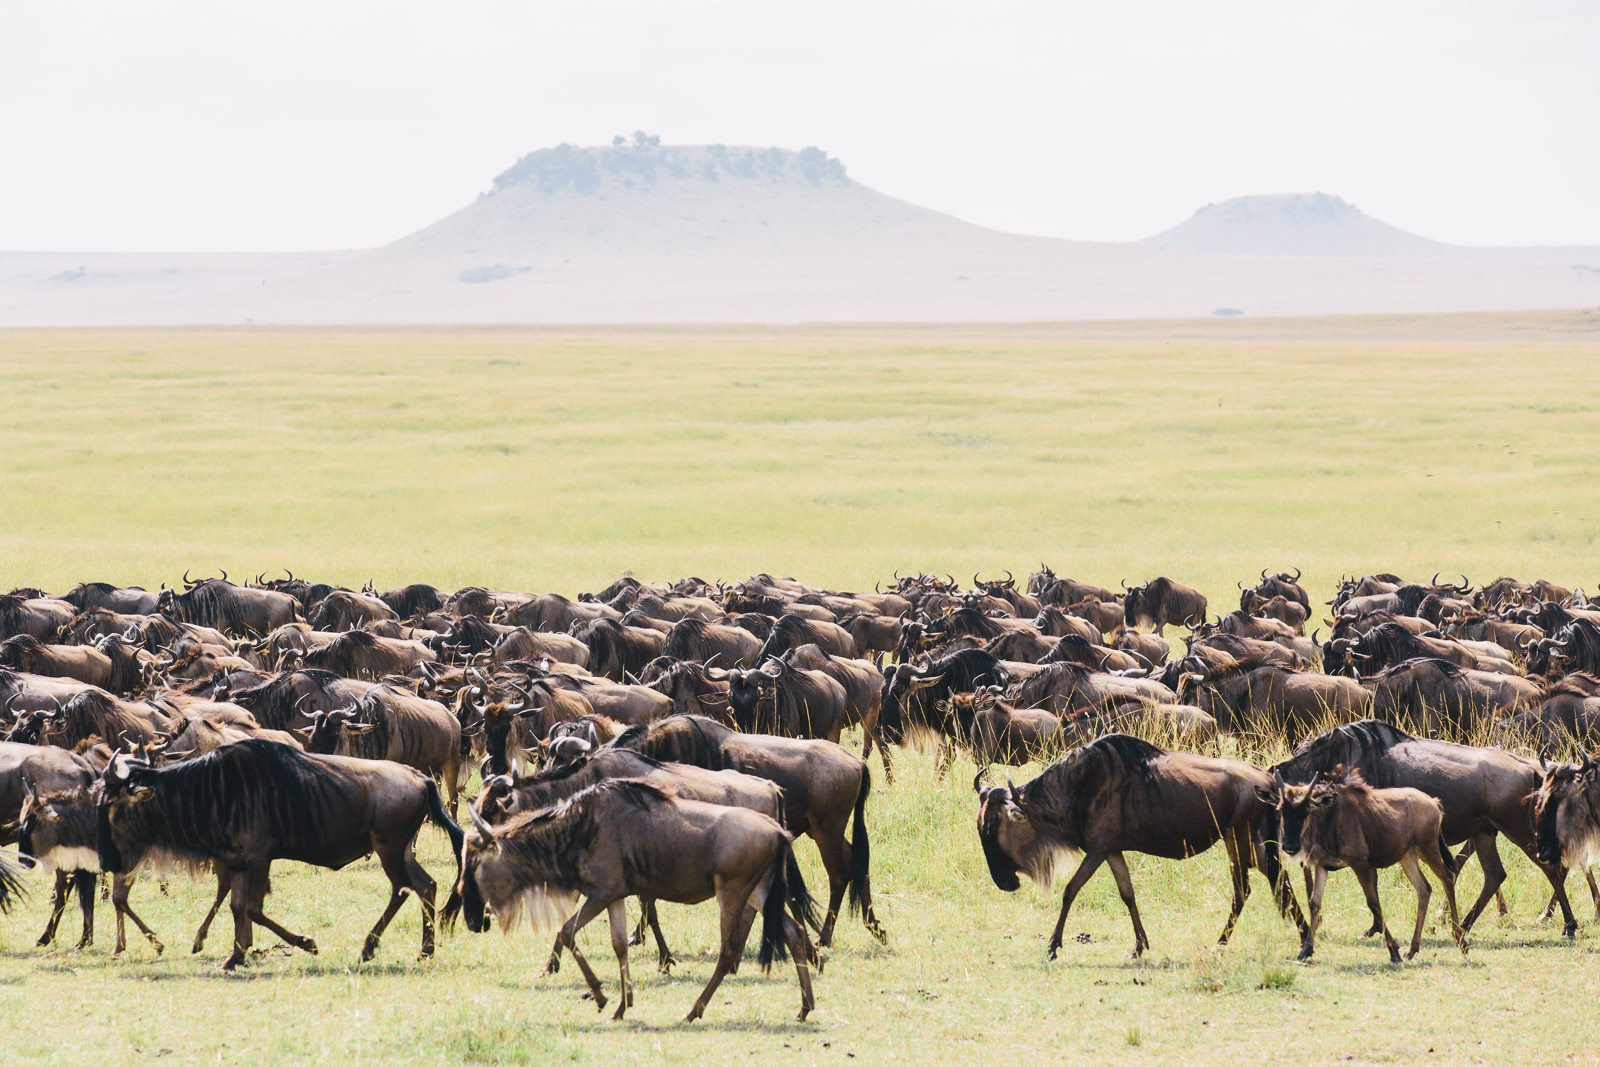 tanzania-africa-travel-photos-adventure-safari-4.jpg